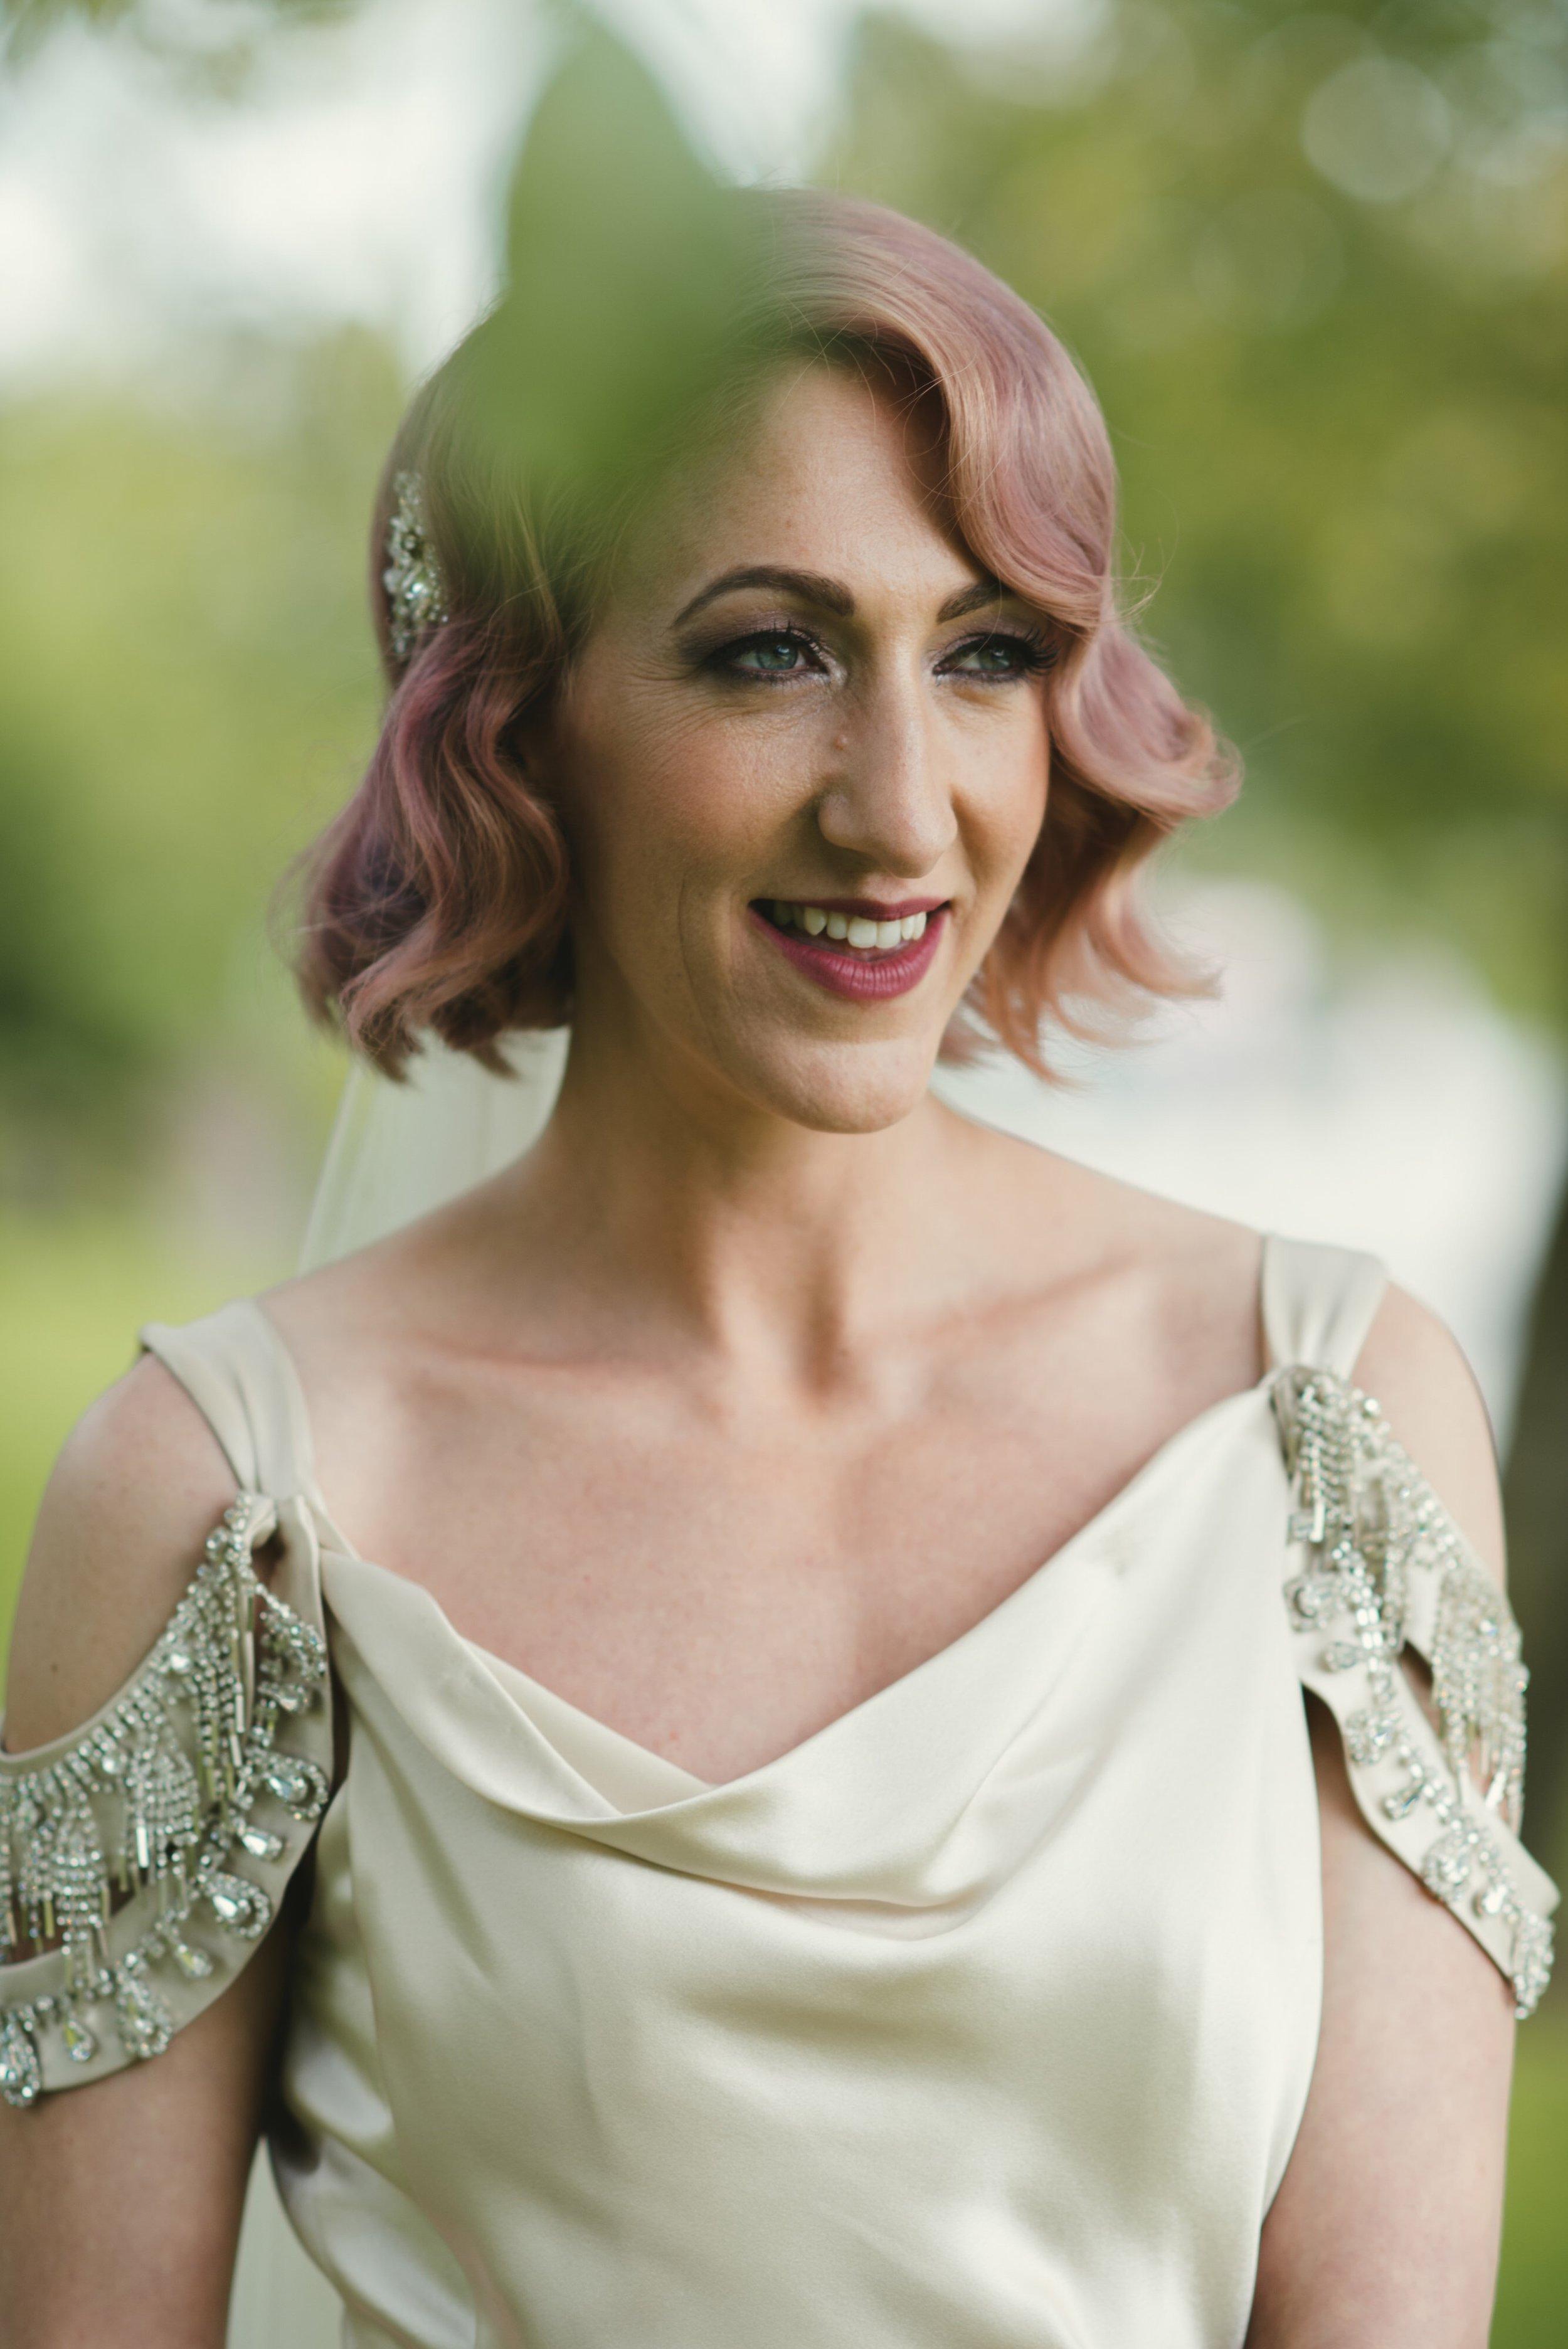 alternative bride pink hair 1930s style.jpg